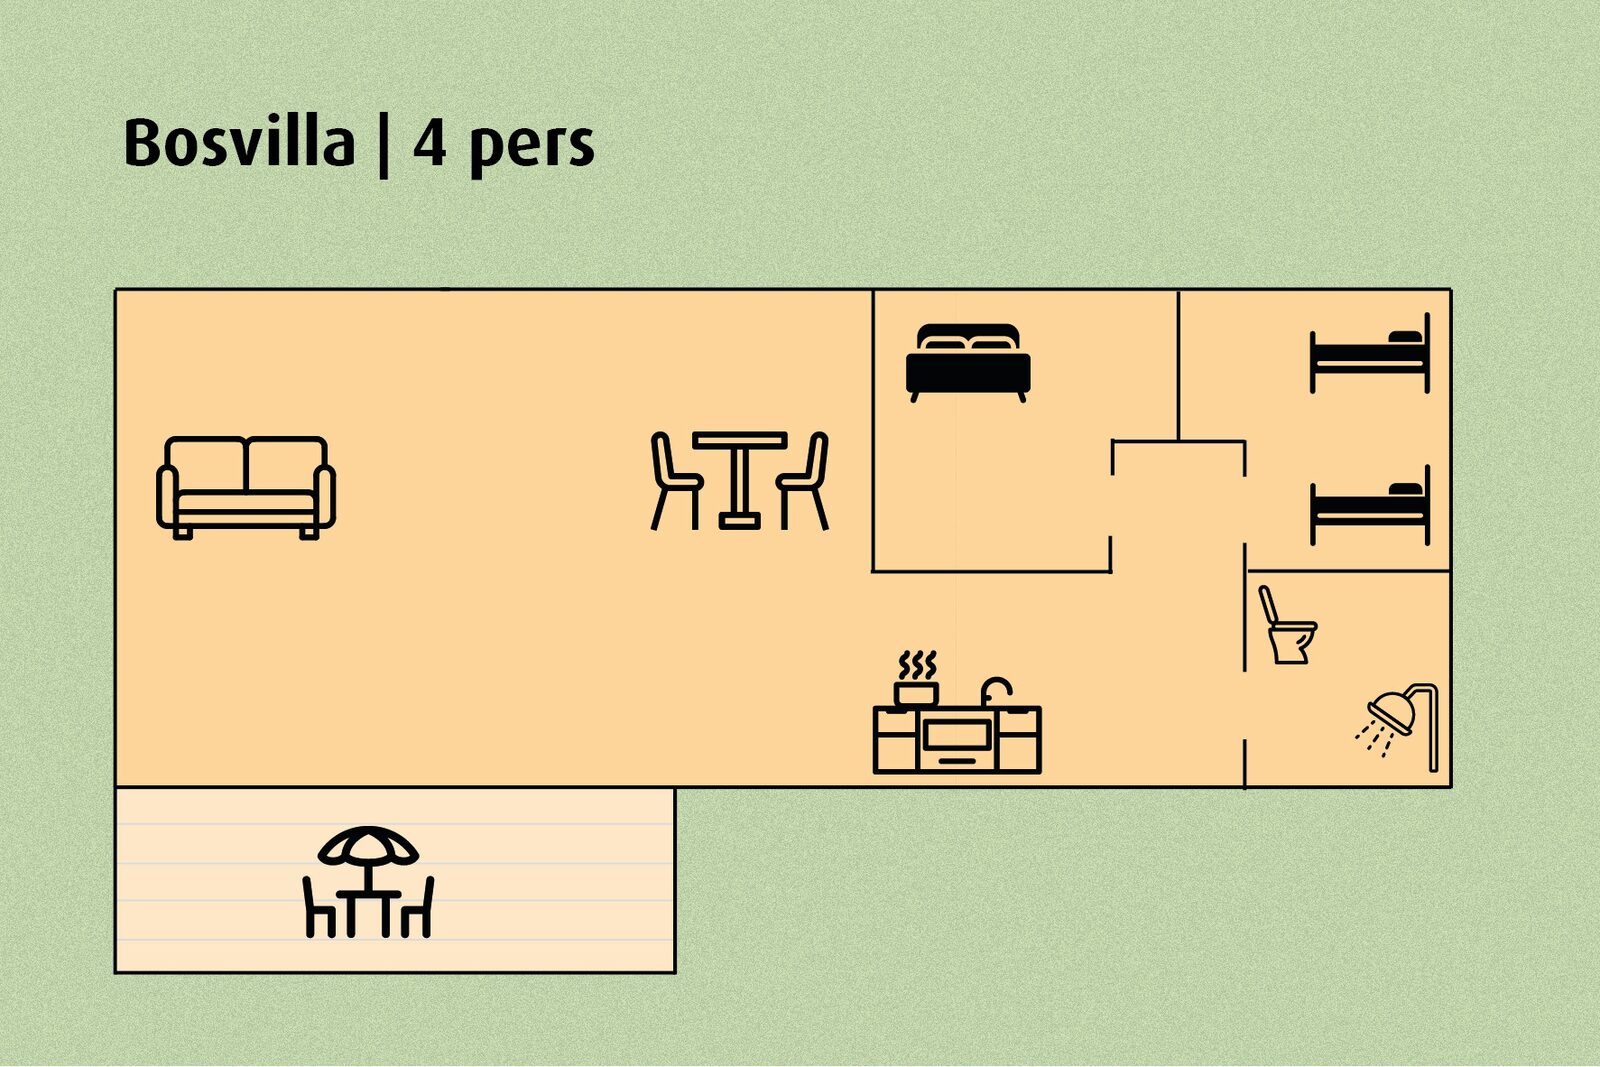 Bosvilla | 4 pers.